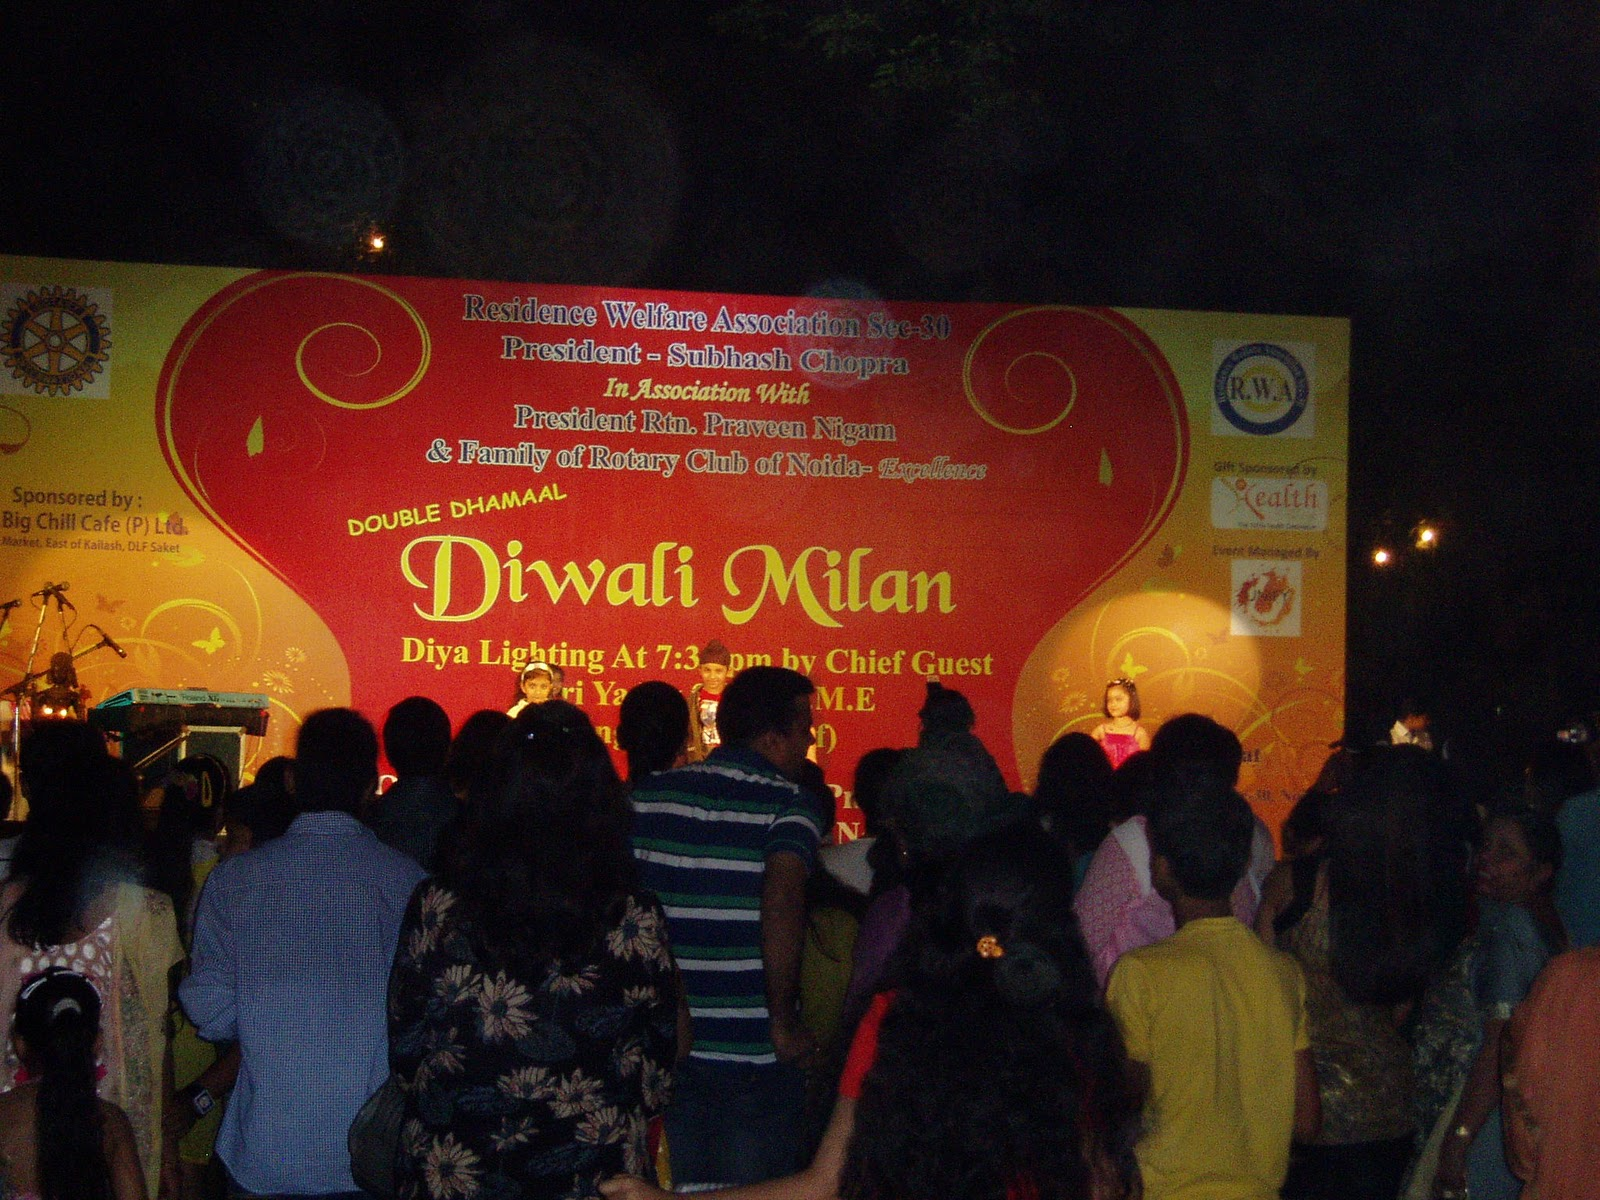 Diwali Mela